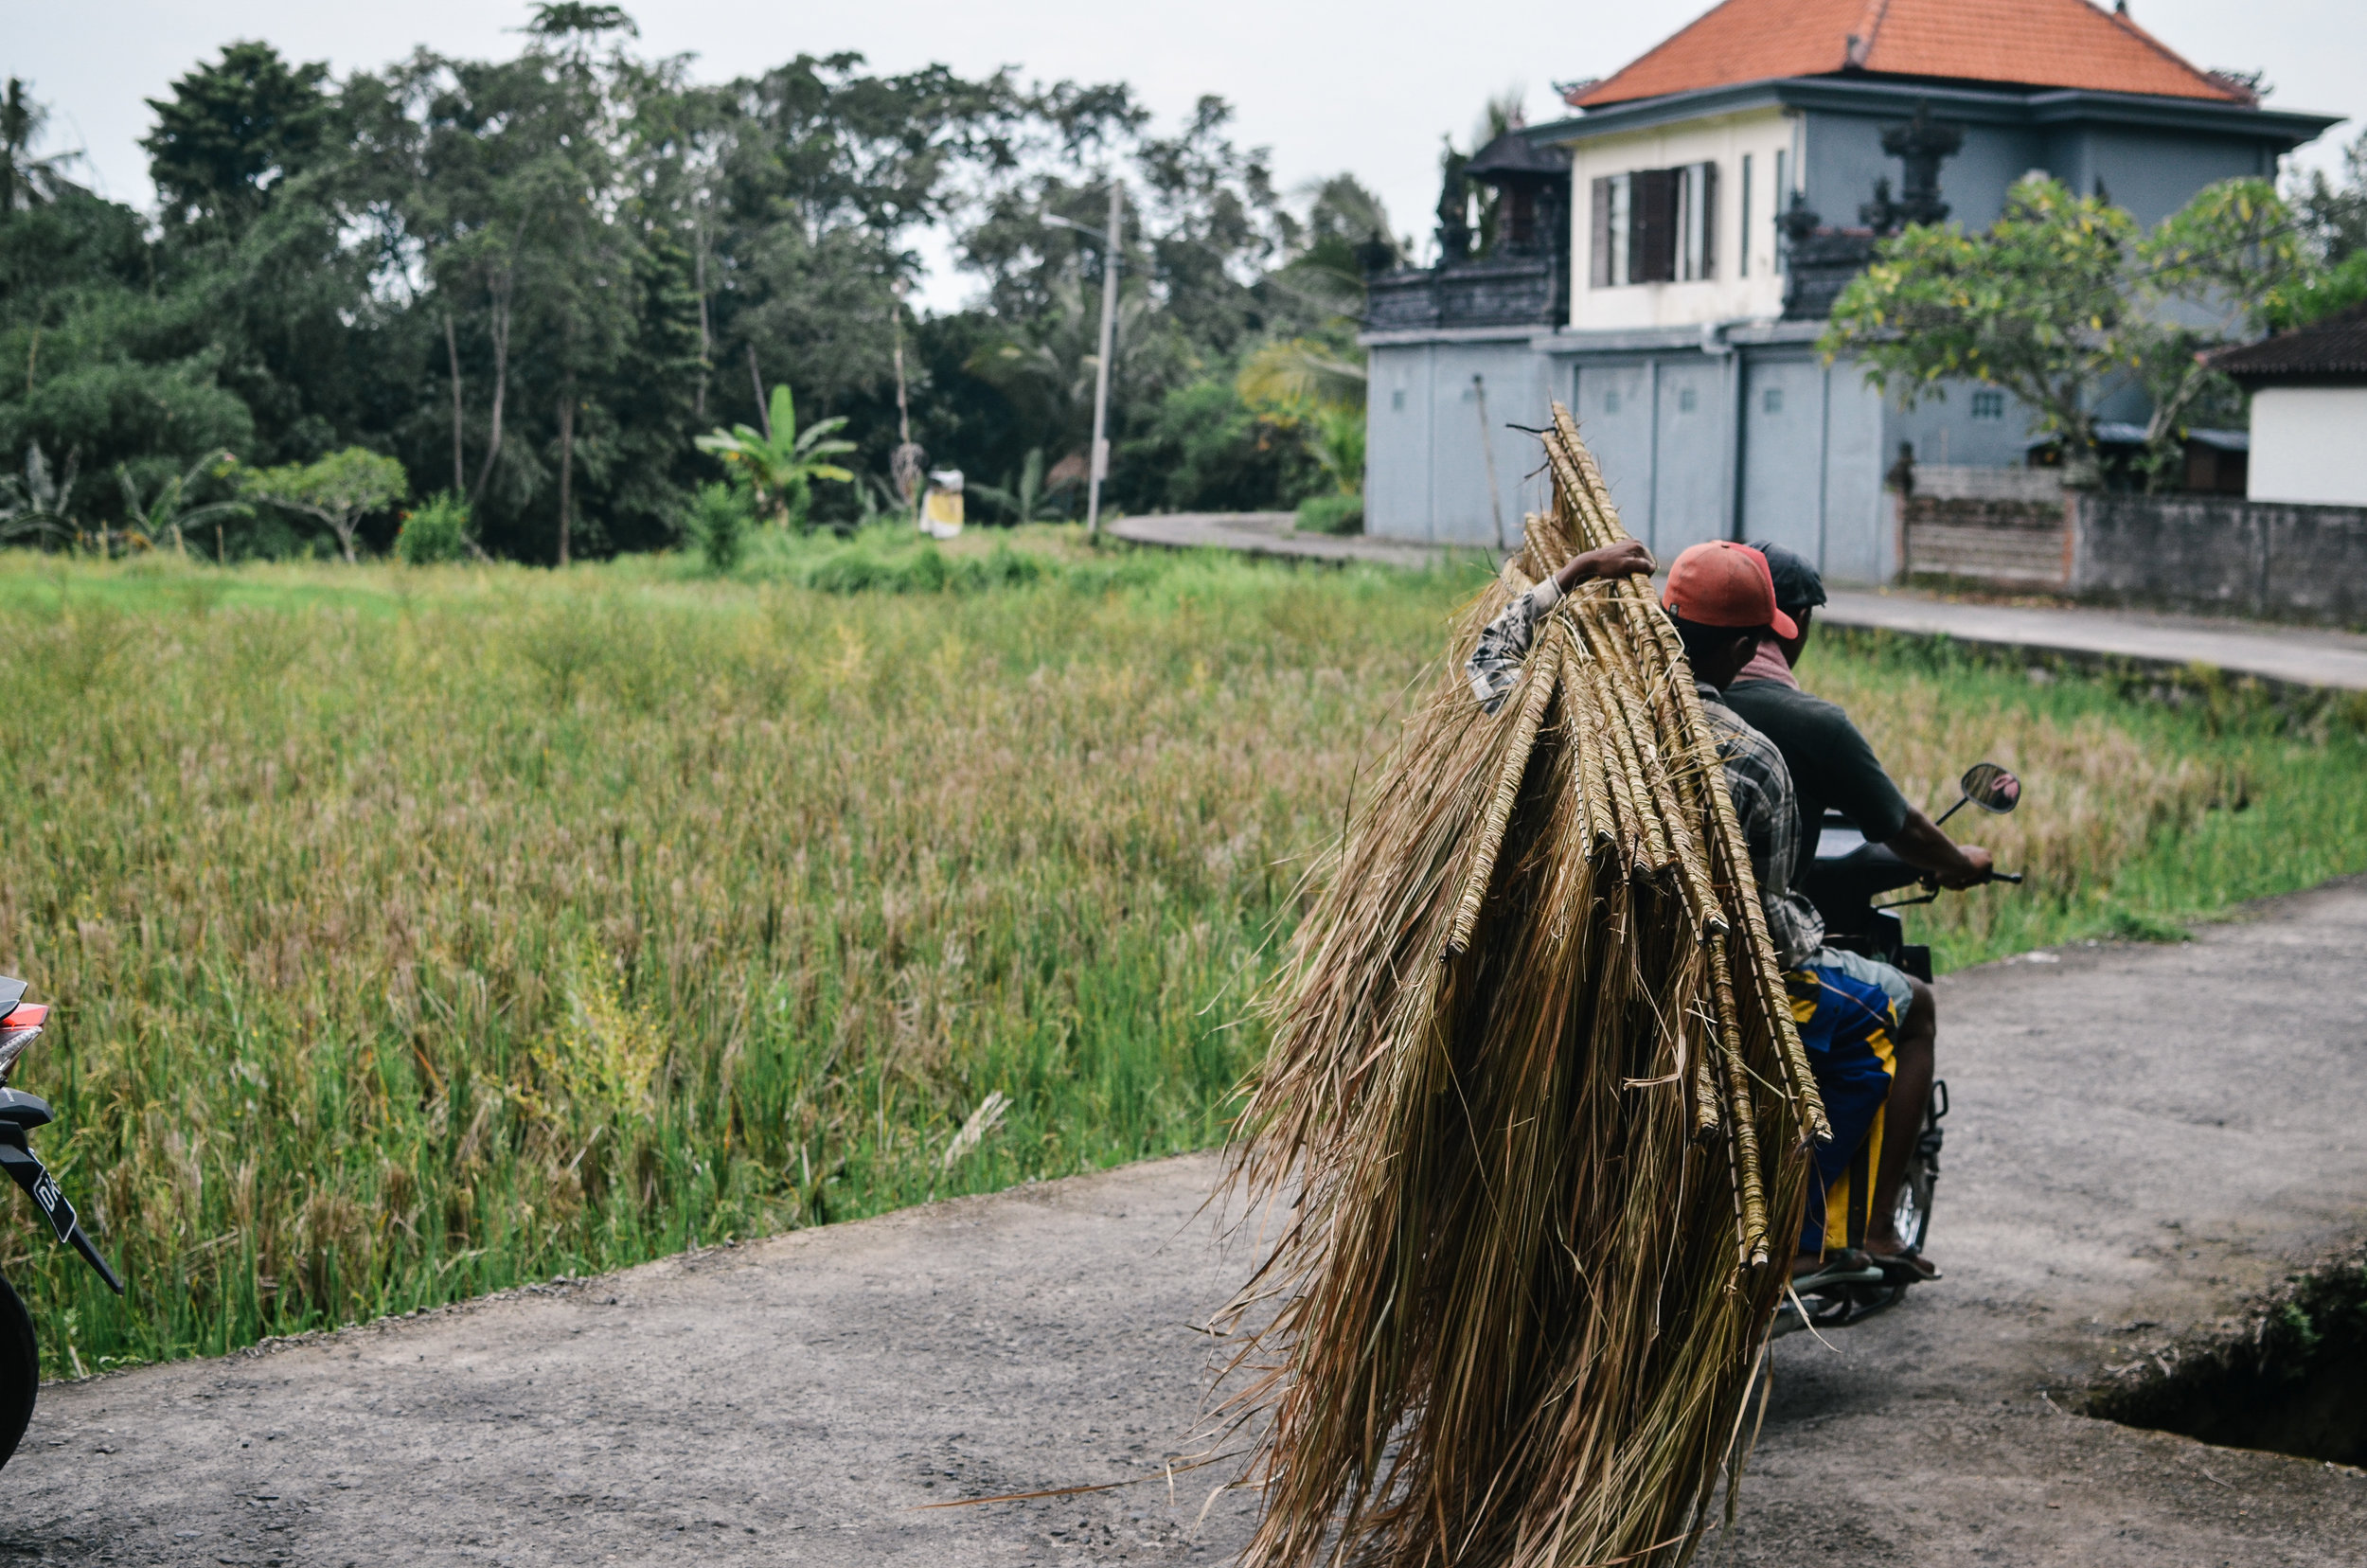 bali+mosca+bamboo+lodge+bali+ubud+lifeonpine_DSC_2750.jpg